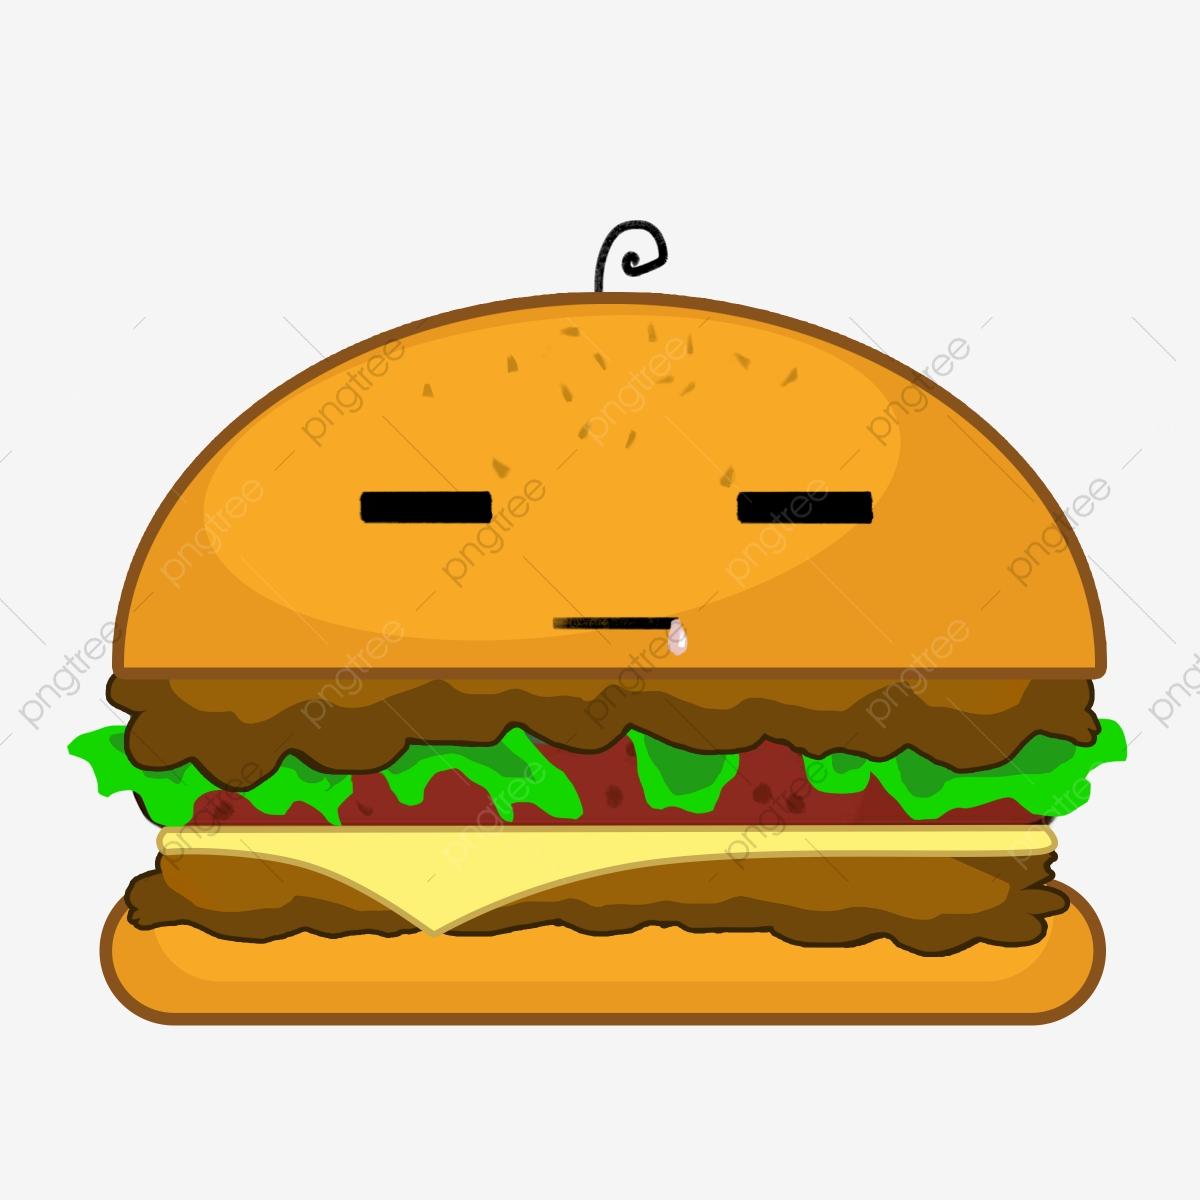 Hamburger clipart layer. Double multi homemade